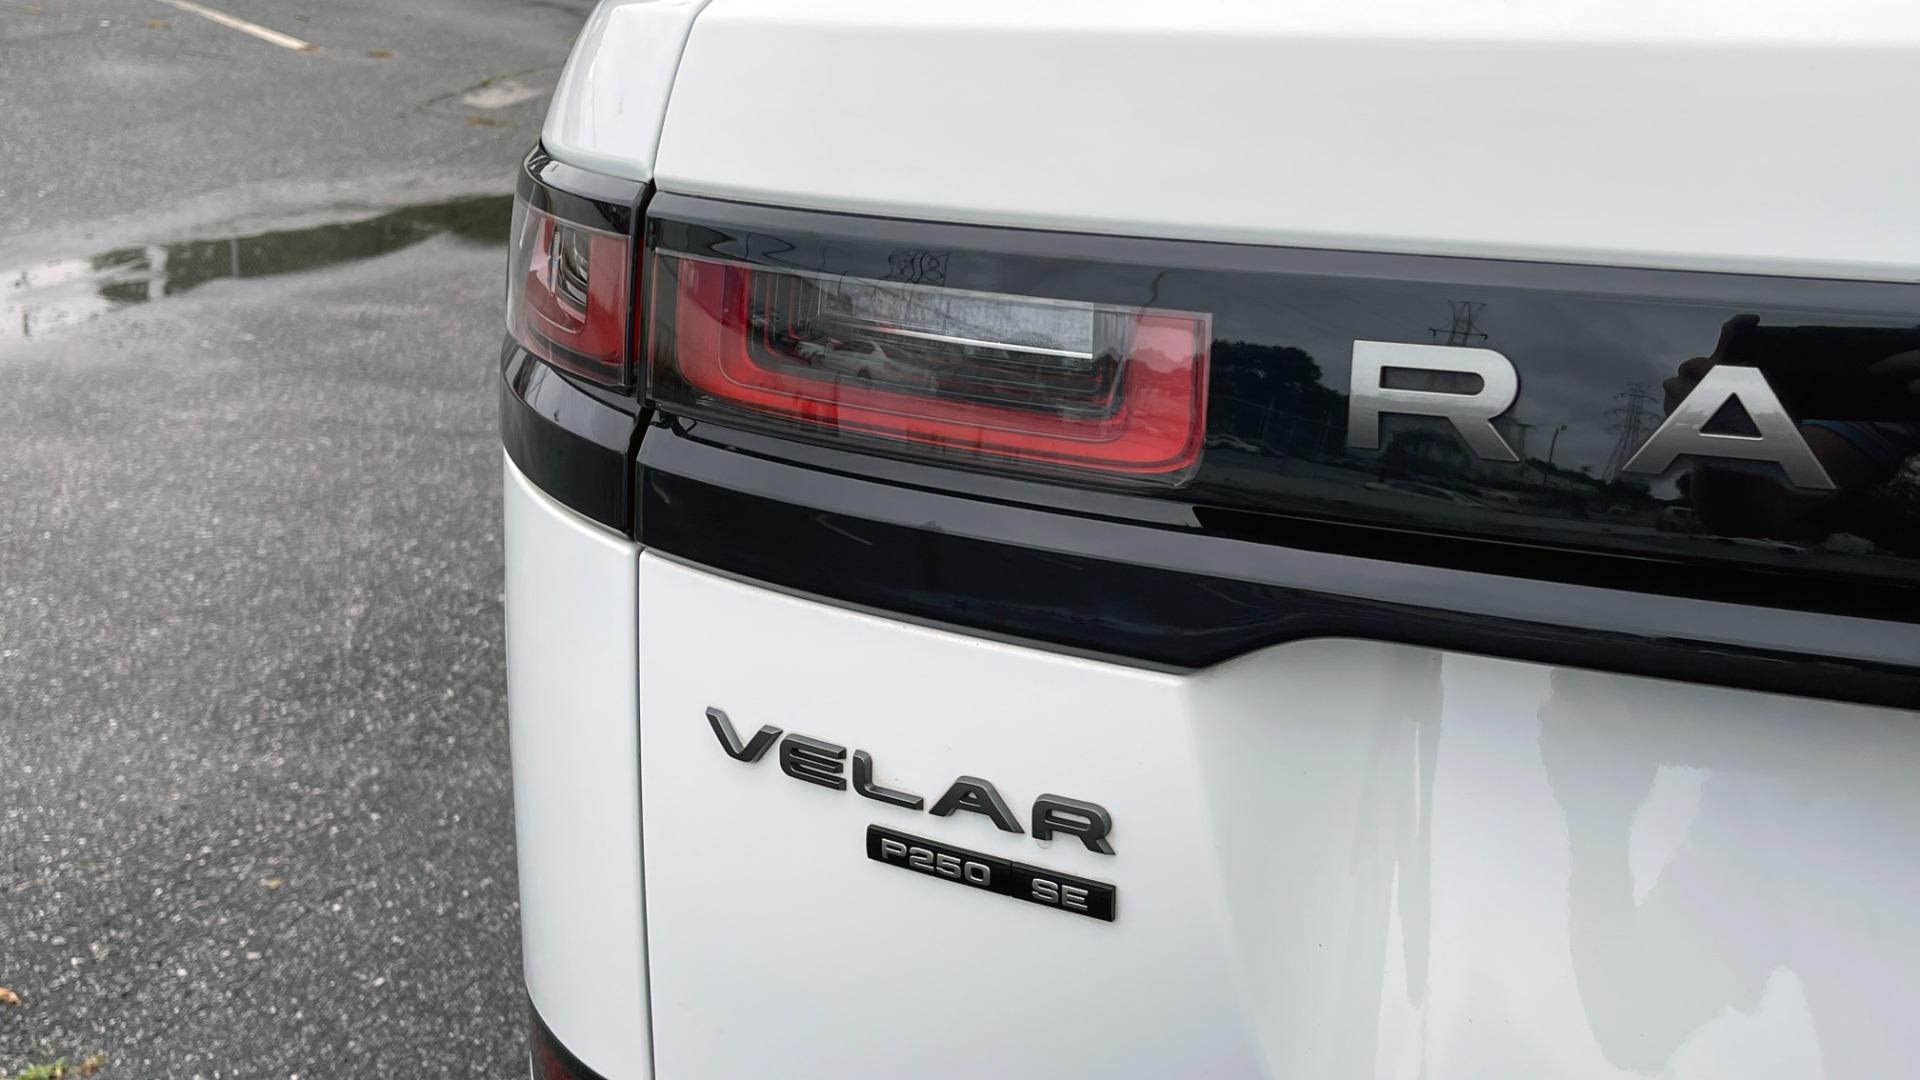 Used 2018 Land Rover RANGE ROVER VELAR R-DYNAMIC SE / NAV / PREM / MERIDIAN / SUNROOF / REARVIEW for sale $54,995 at Formula Imports in Charlotte NC 28227 17